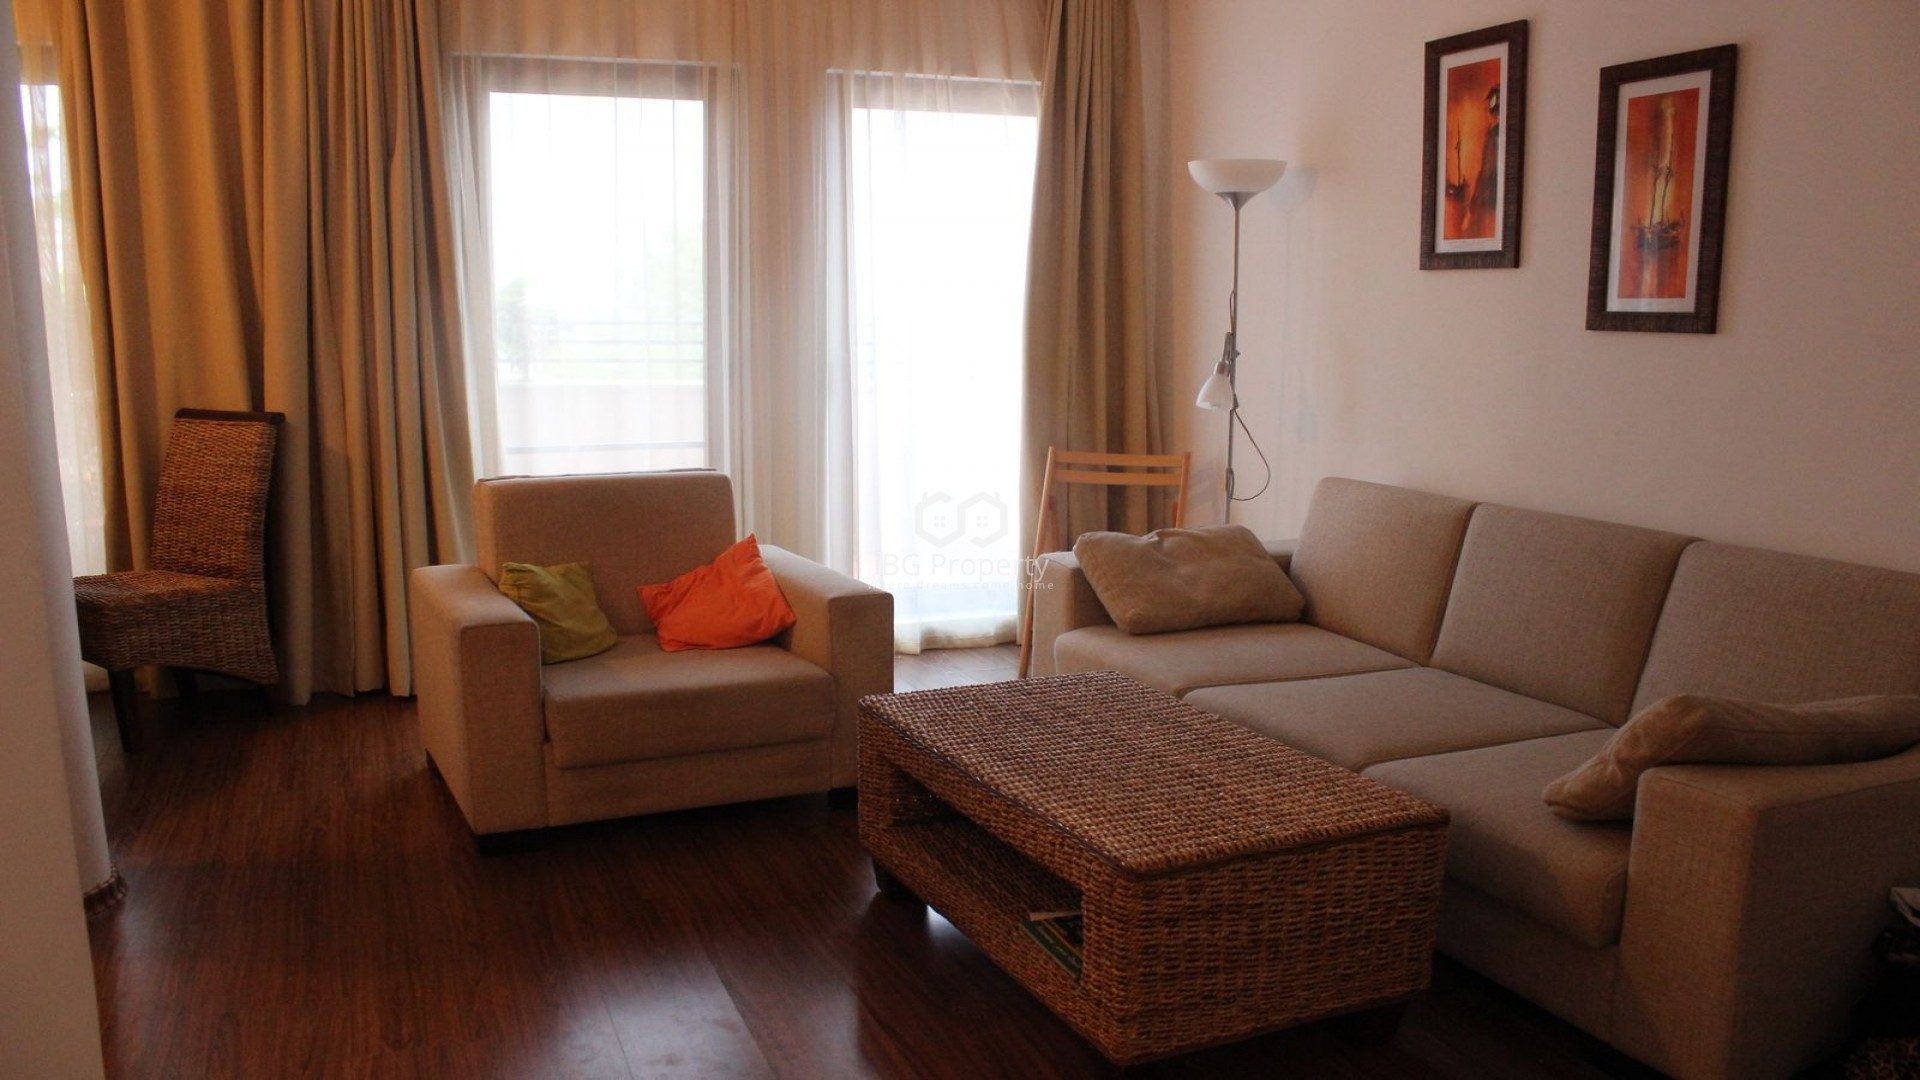 Tристаен апартамент Ахелой  91 m2